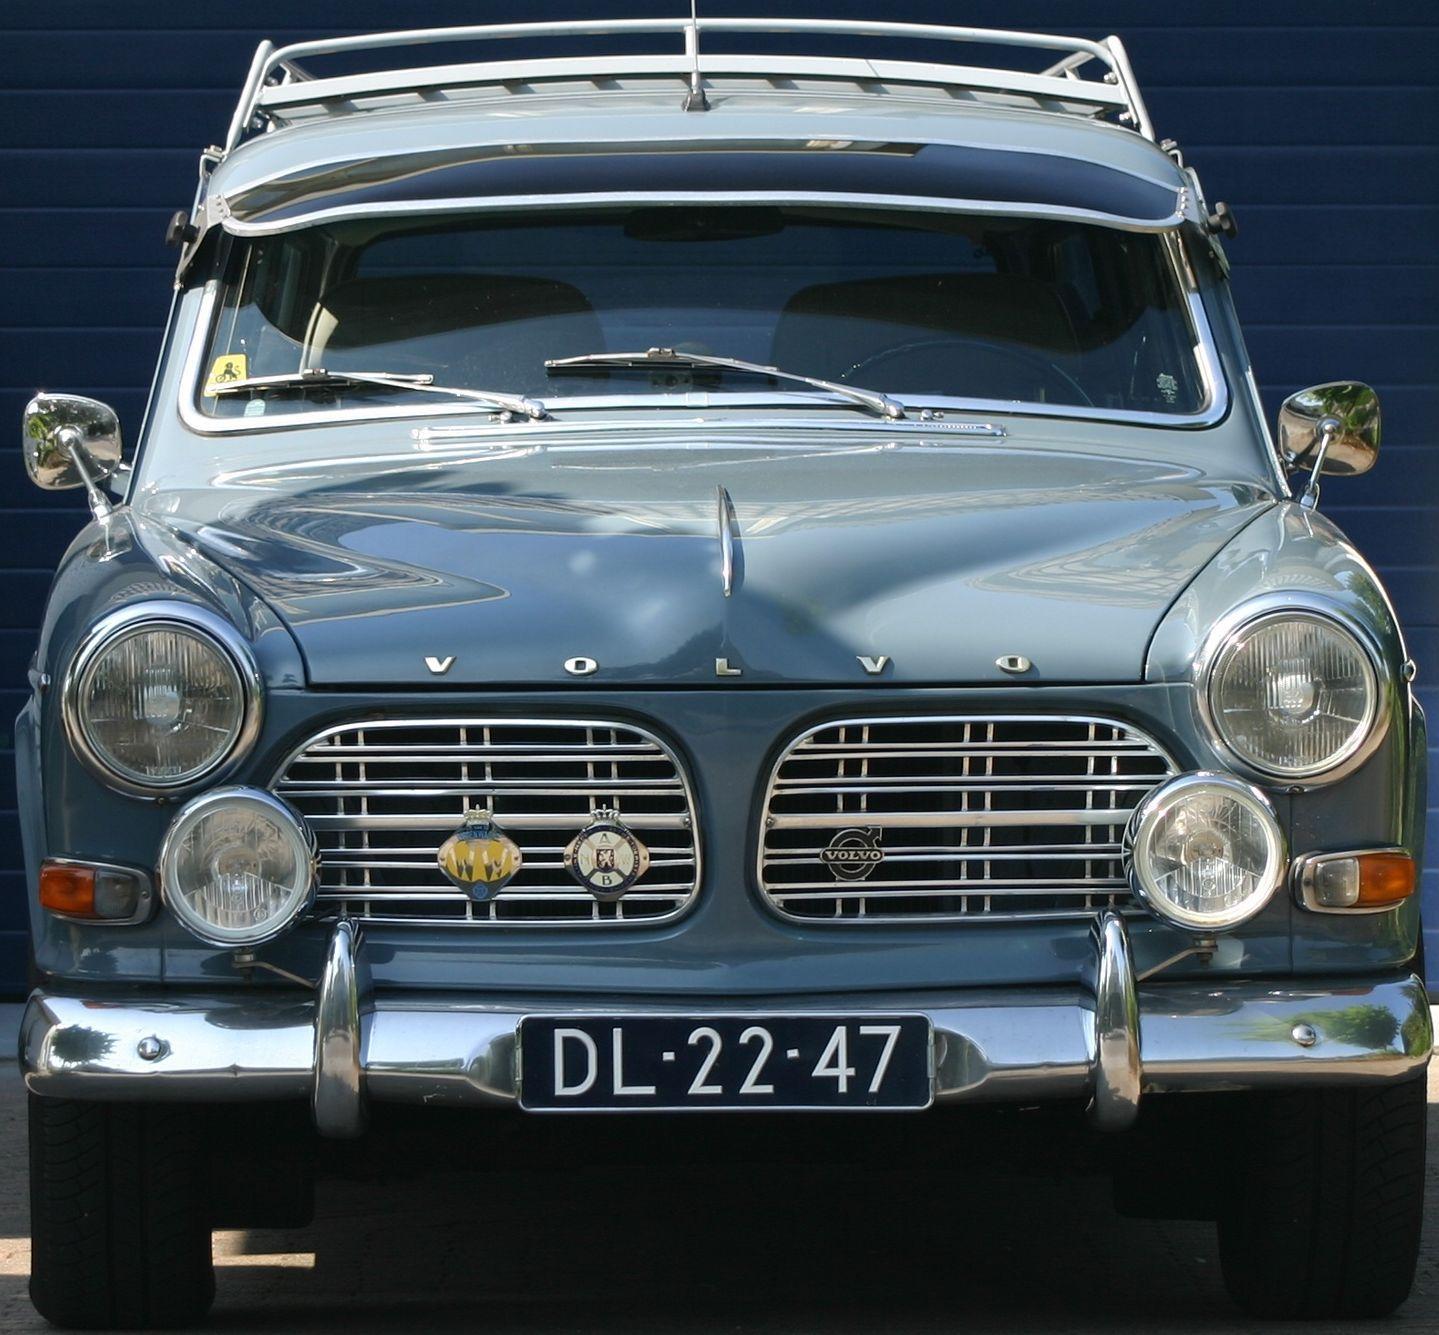 Pin by Jamie Cole on VOLVO ❤️ | Volvo amazon, Volvo wagon